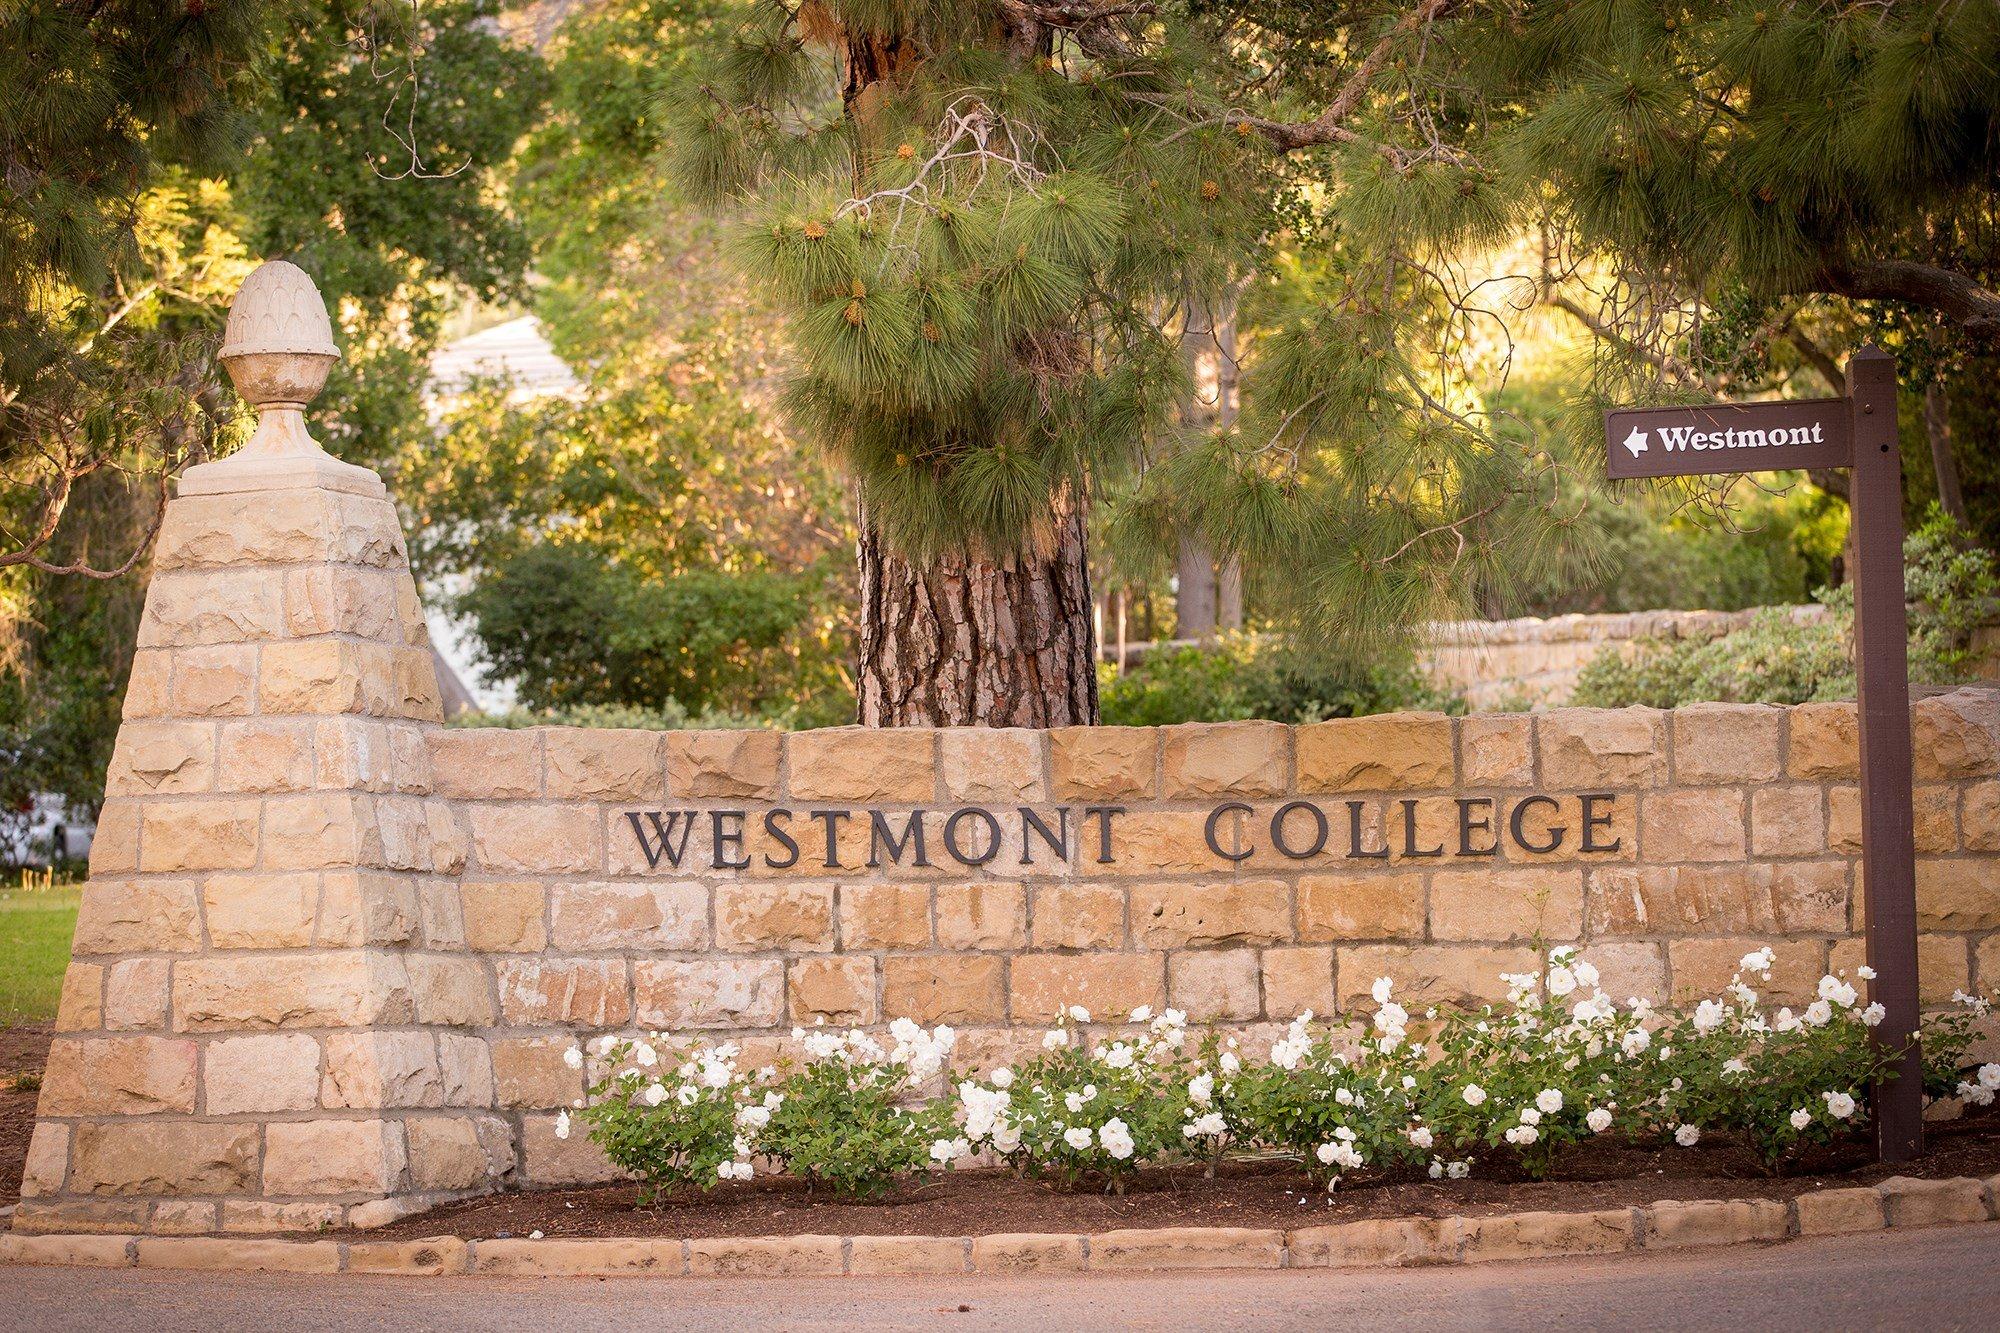 (Photo courtesy Westmont College)